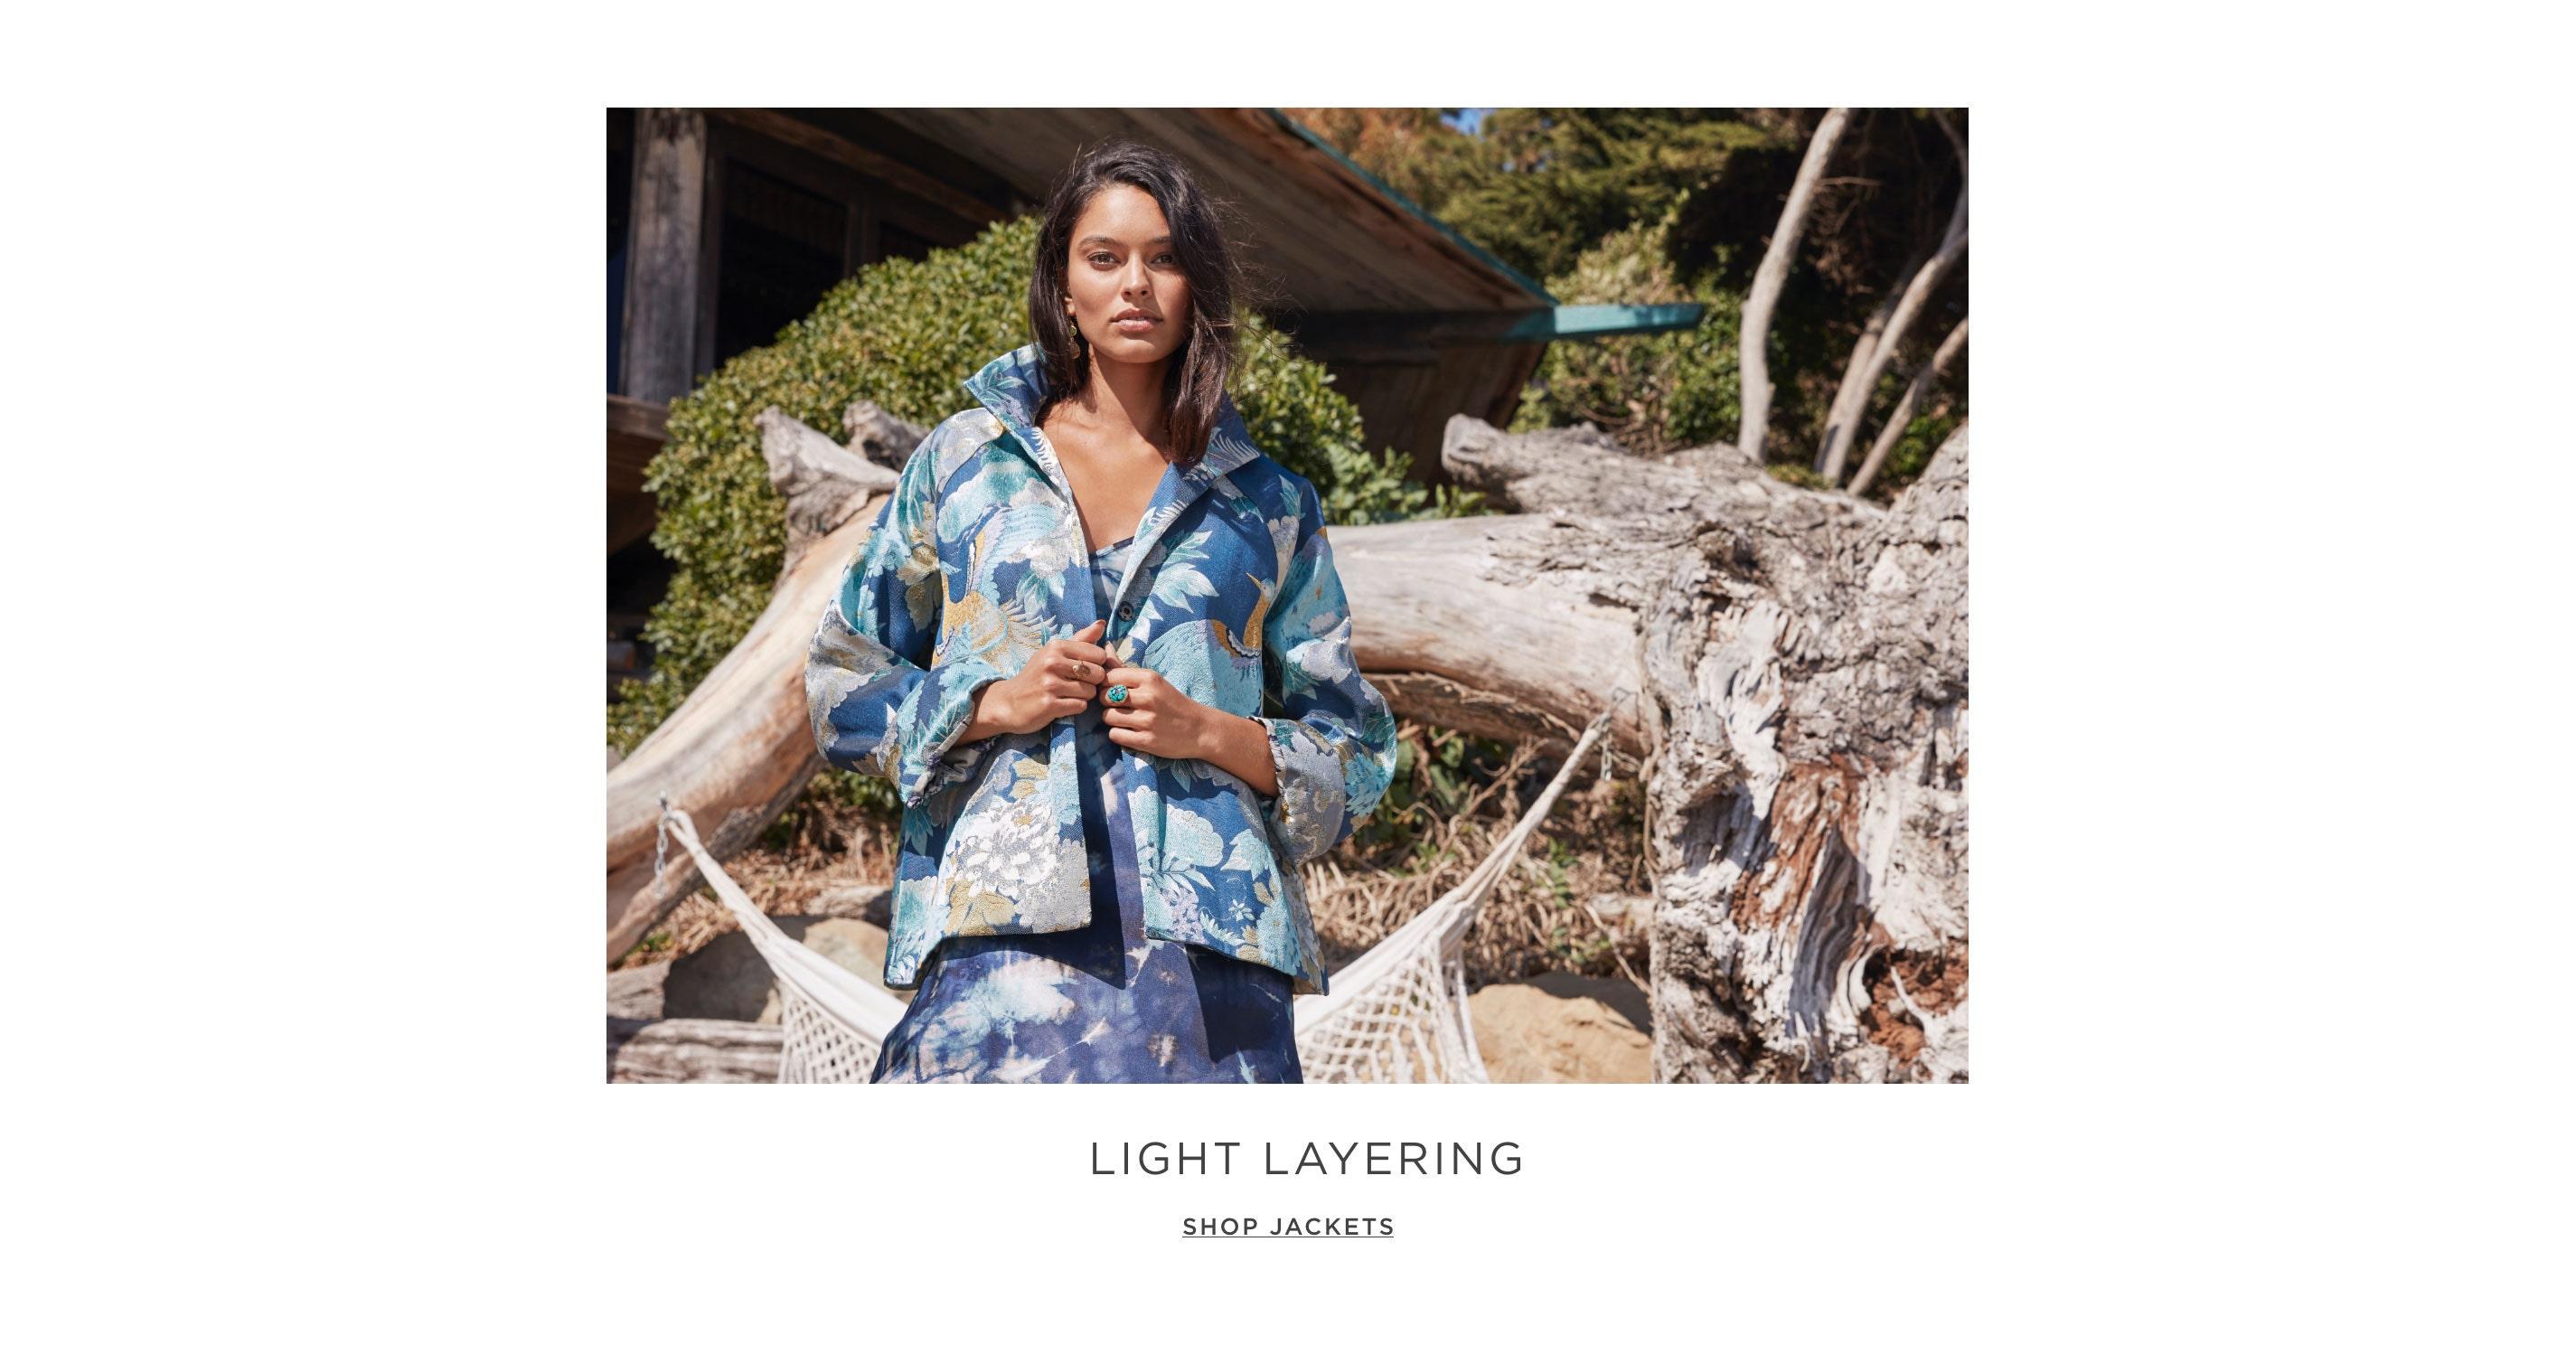 Light Layering - Shop Jackets